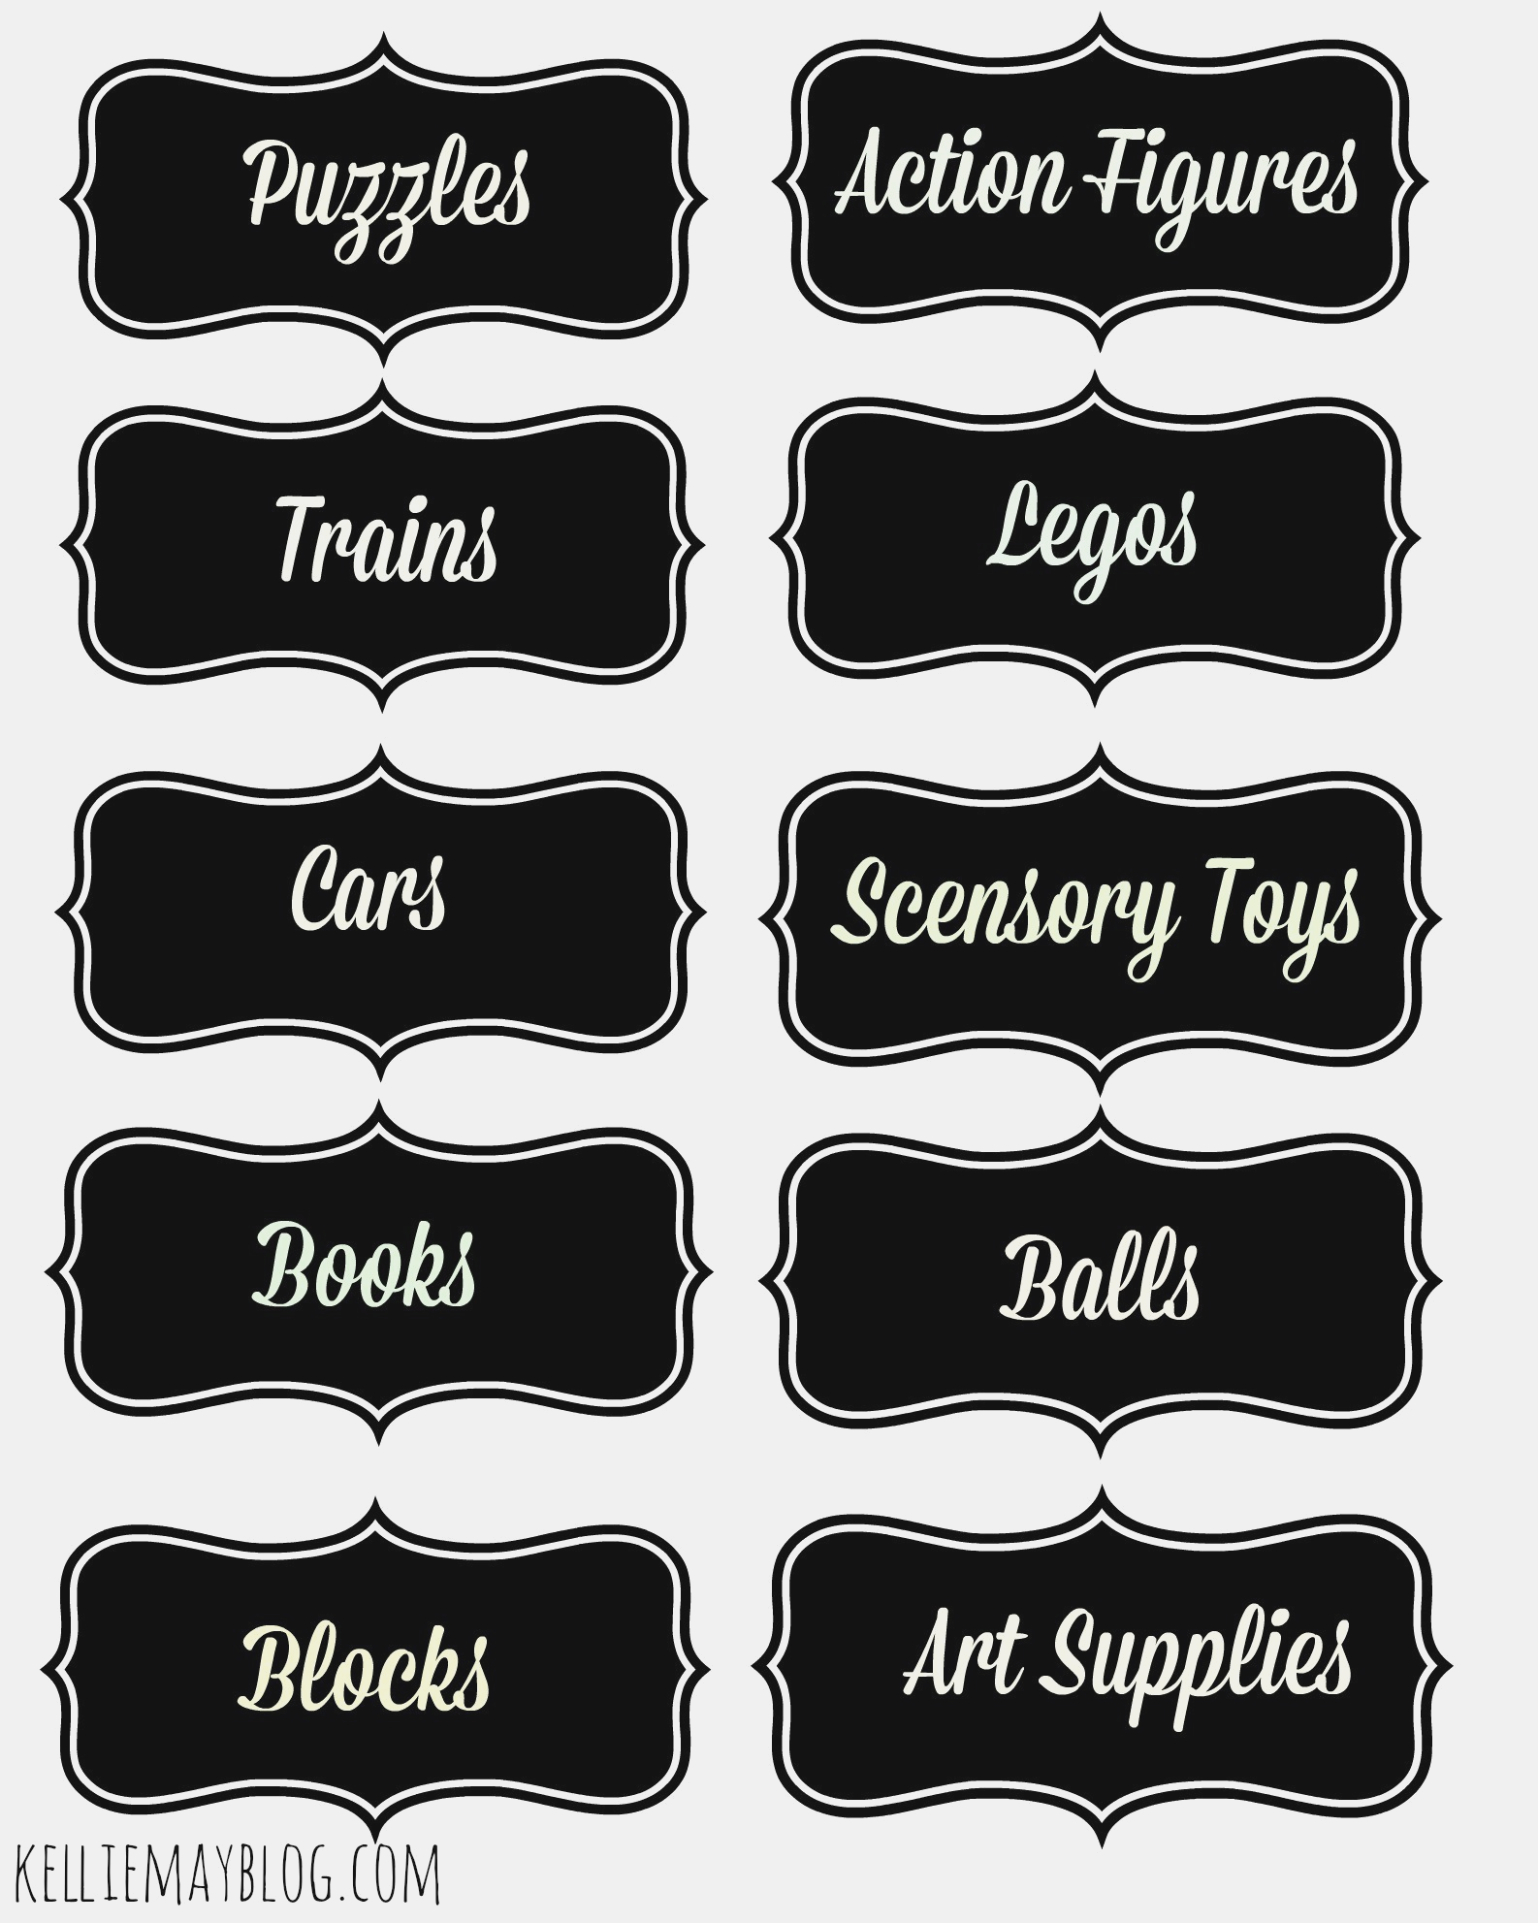 Book Bin Labels Printable | Popisgrzegorz – Label Maker Ideas - Free Printable Book Bin Labels